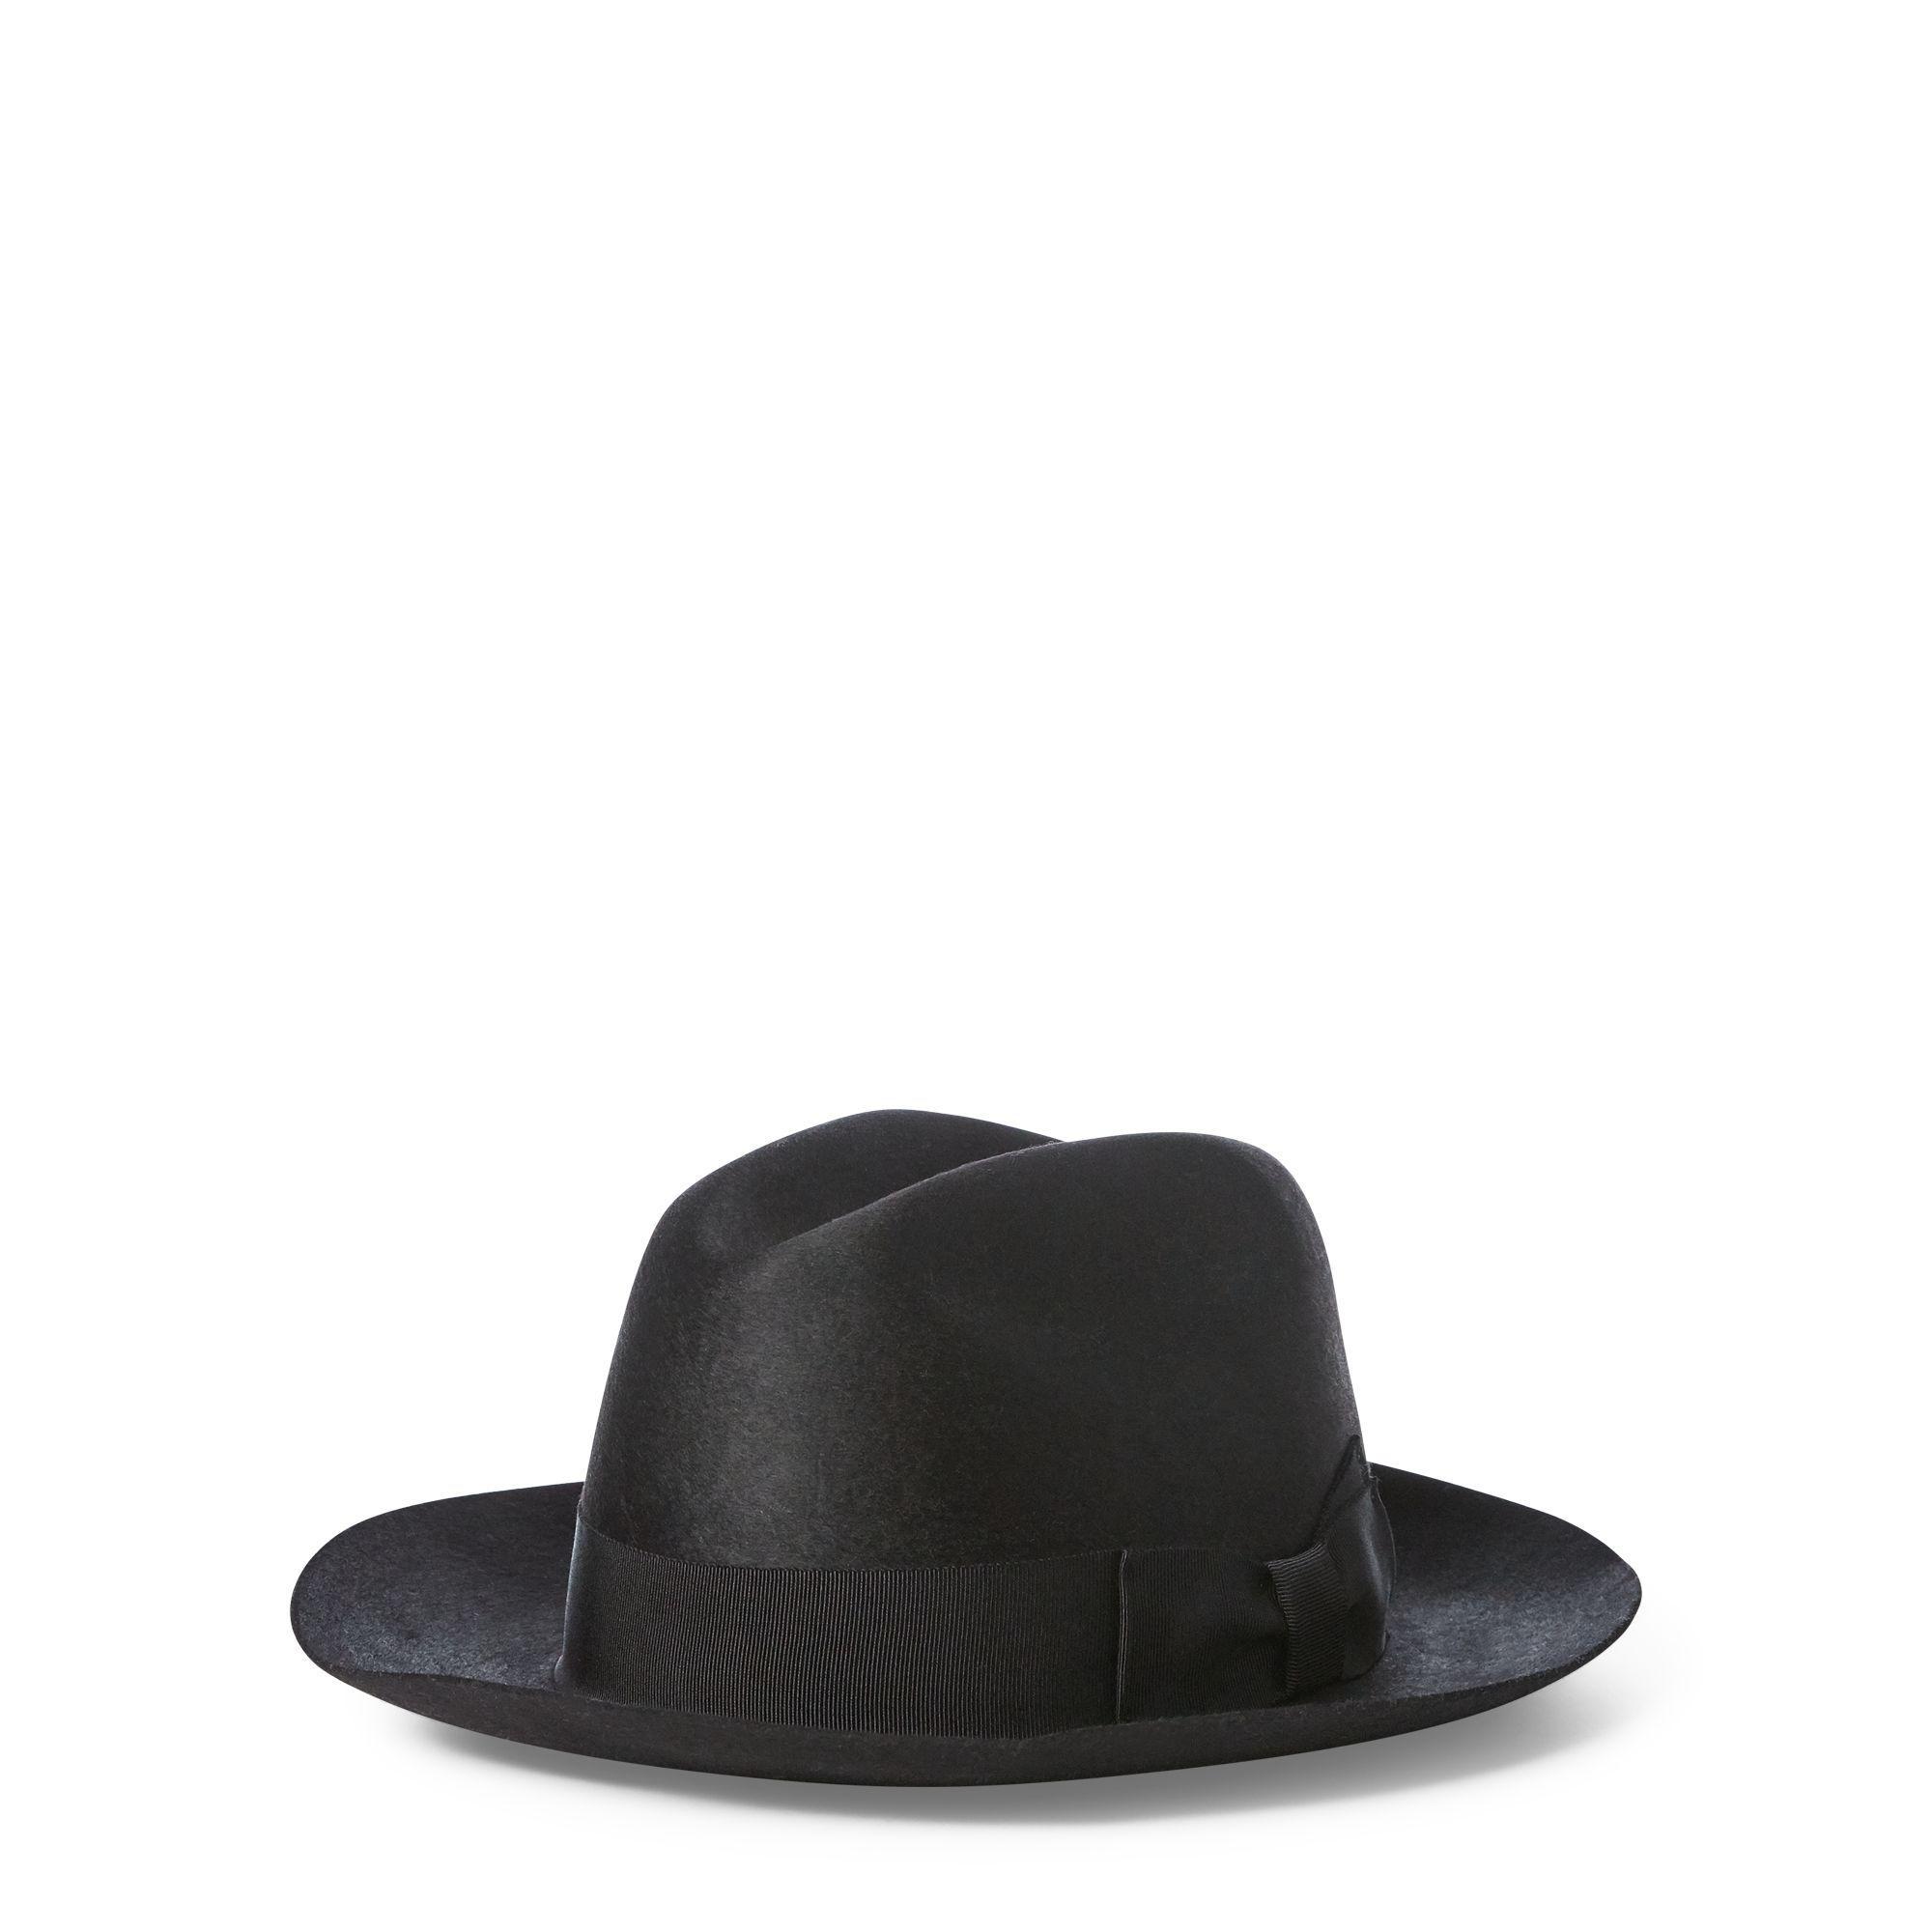 Lyst - Polo Ralph Lauren Wool Felt Fedora in Black - Save 39% 877c06a01c8a